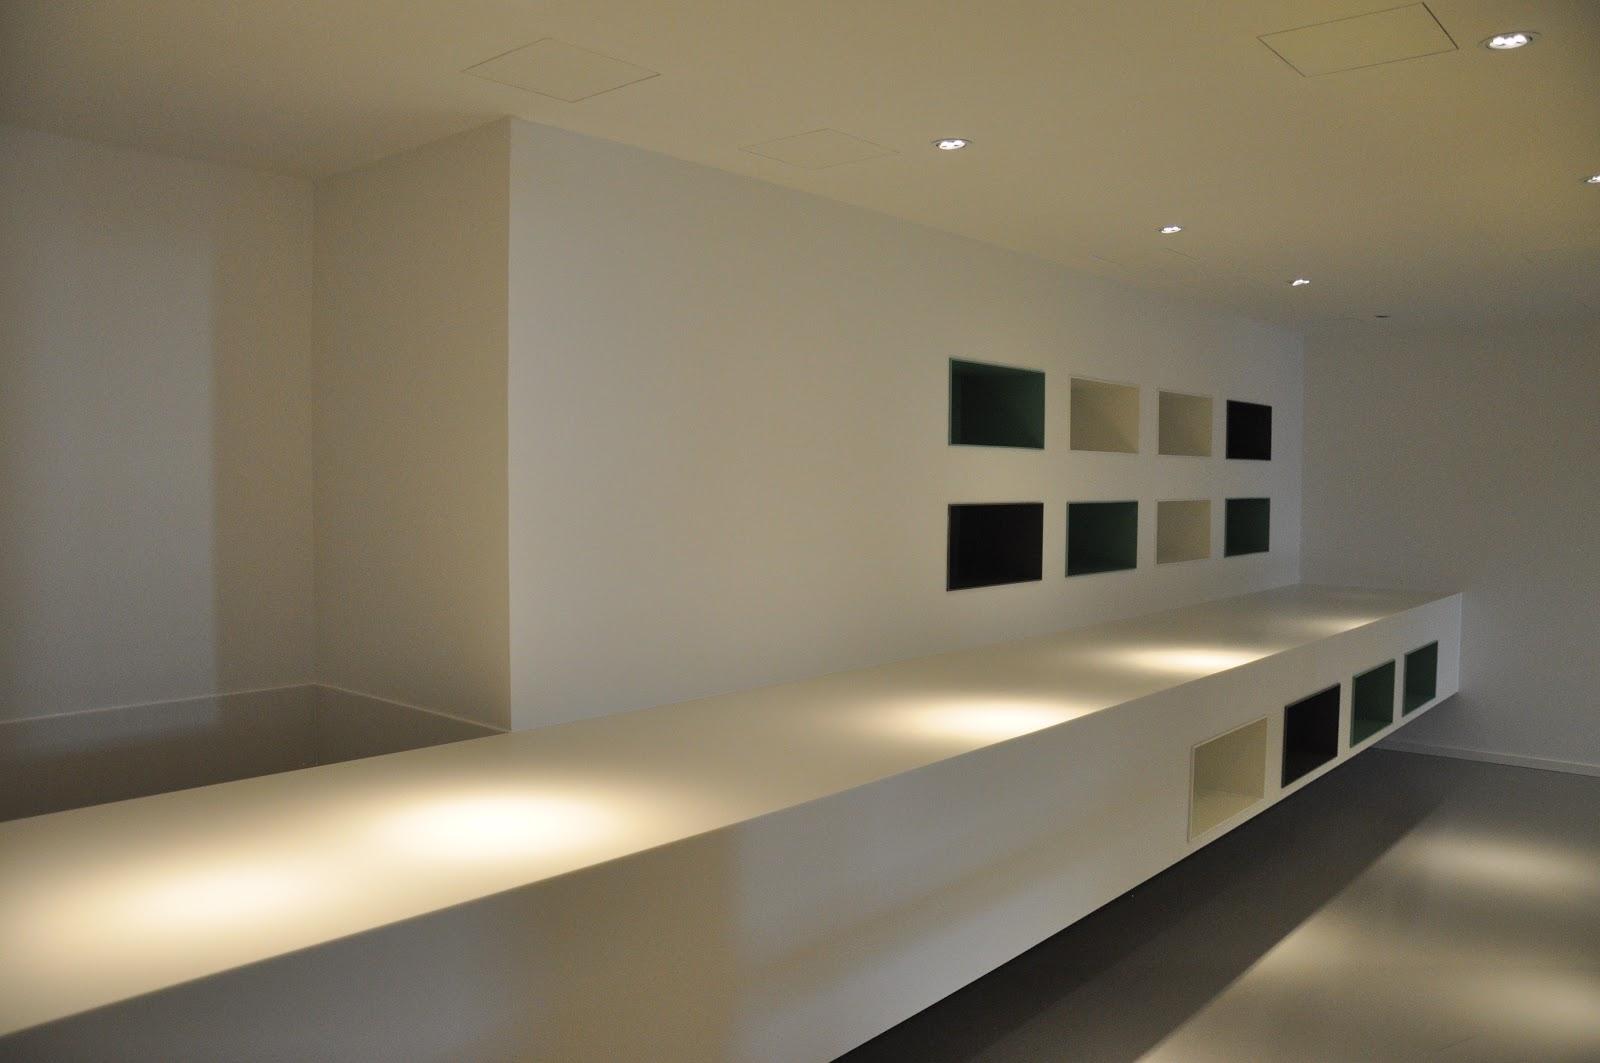 Frederiks Interieurs: Spaces Den Haag